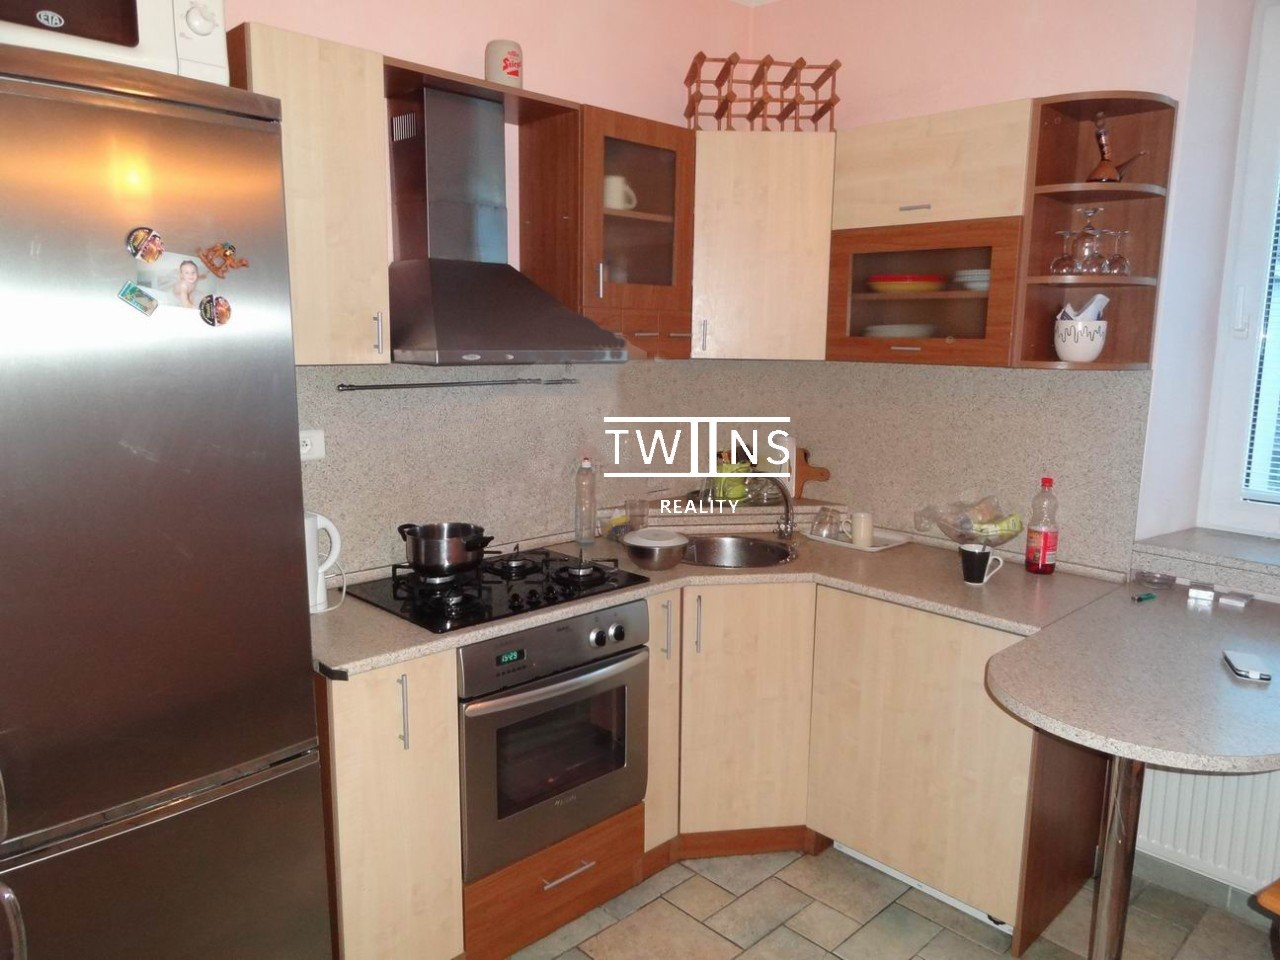 Prenajmeme 1,5 izbový byt v Bratislave vo vyhladavenéj časti Nivy ..